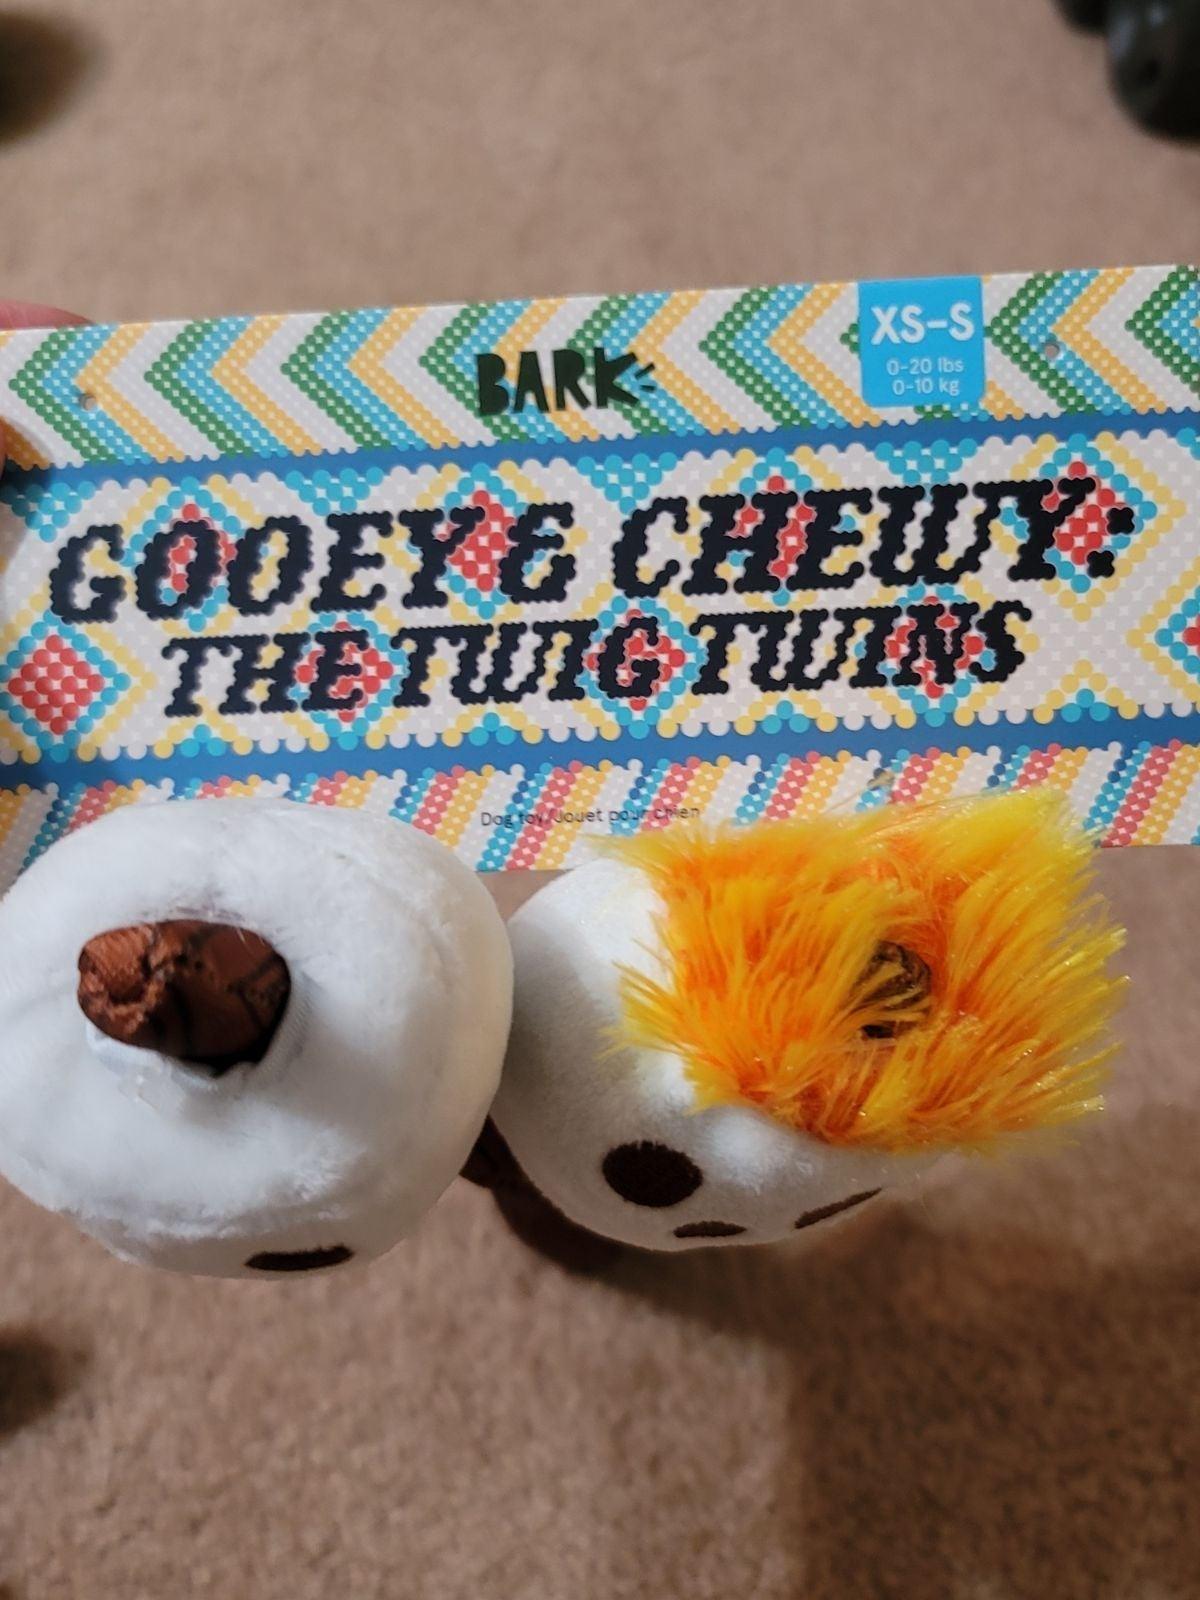 Barkbox Gooey & Chewy the twig twins